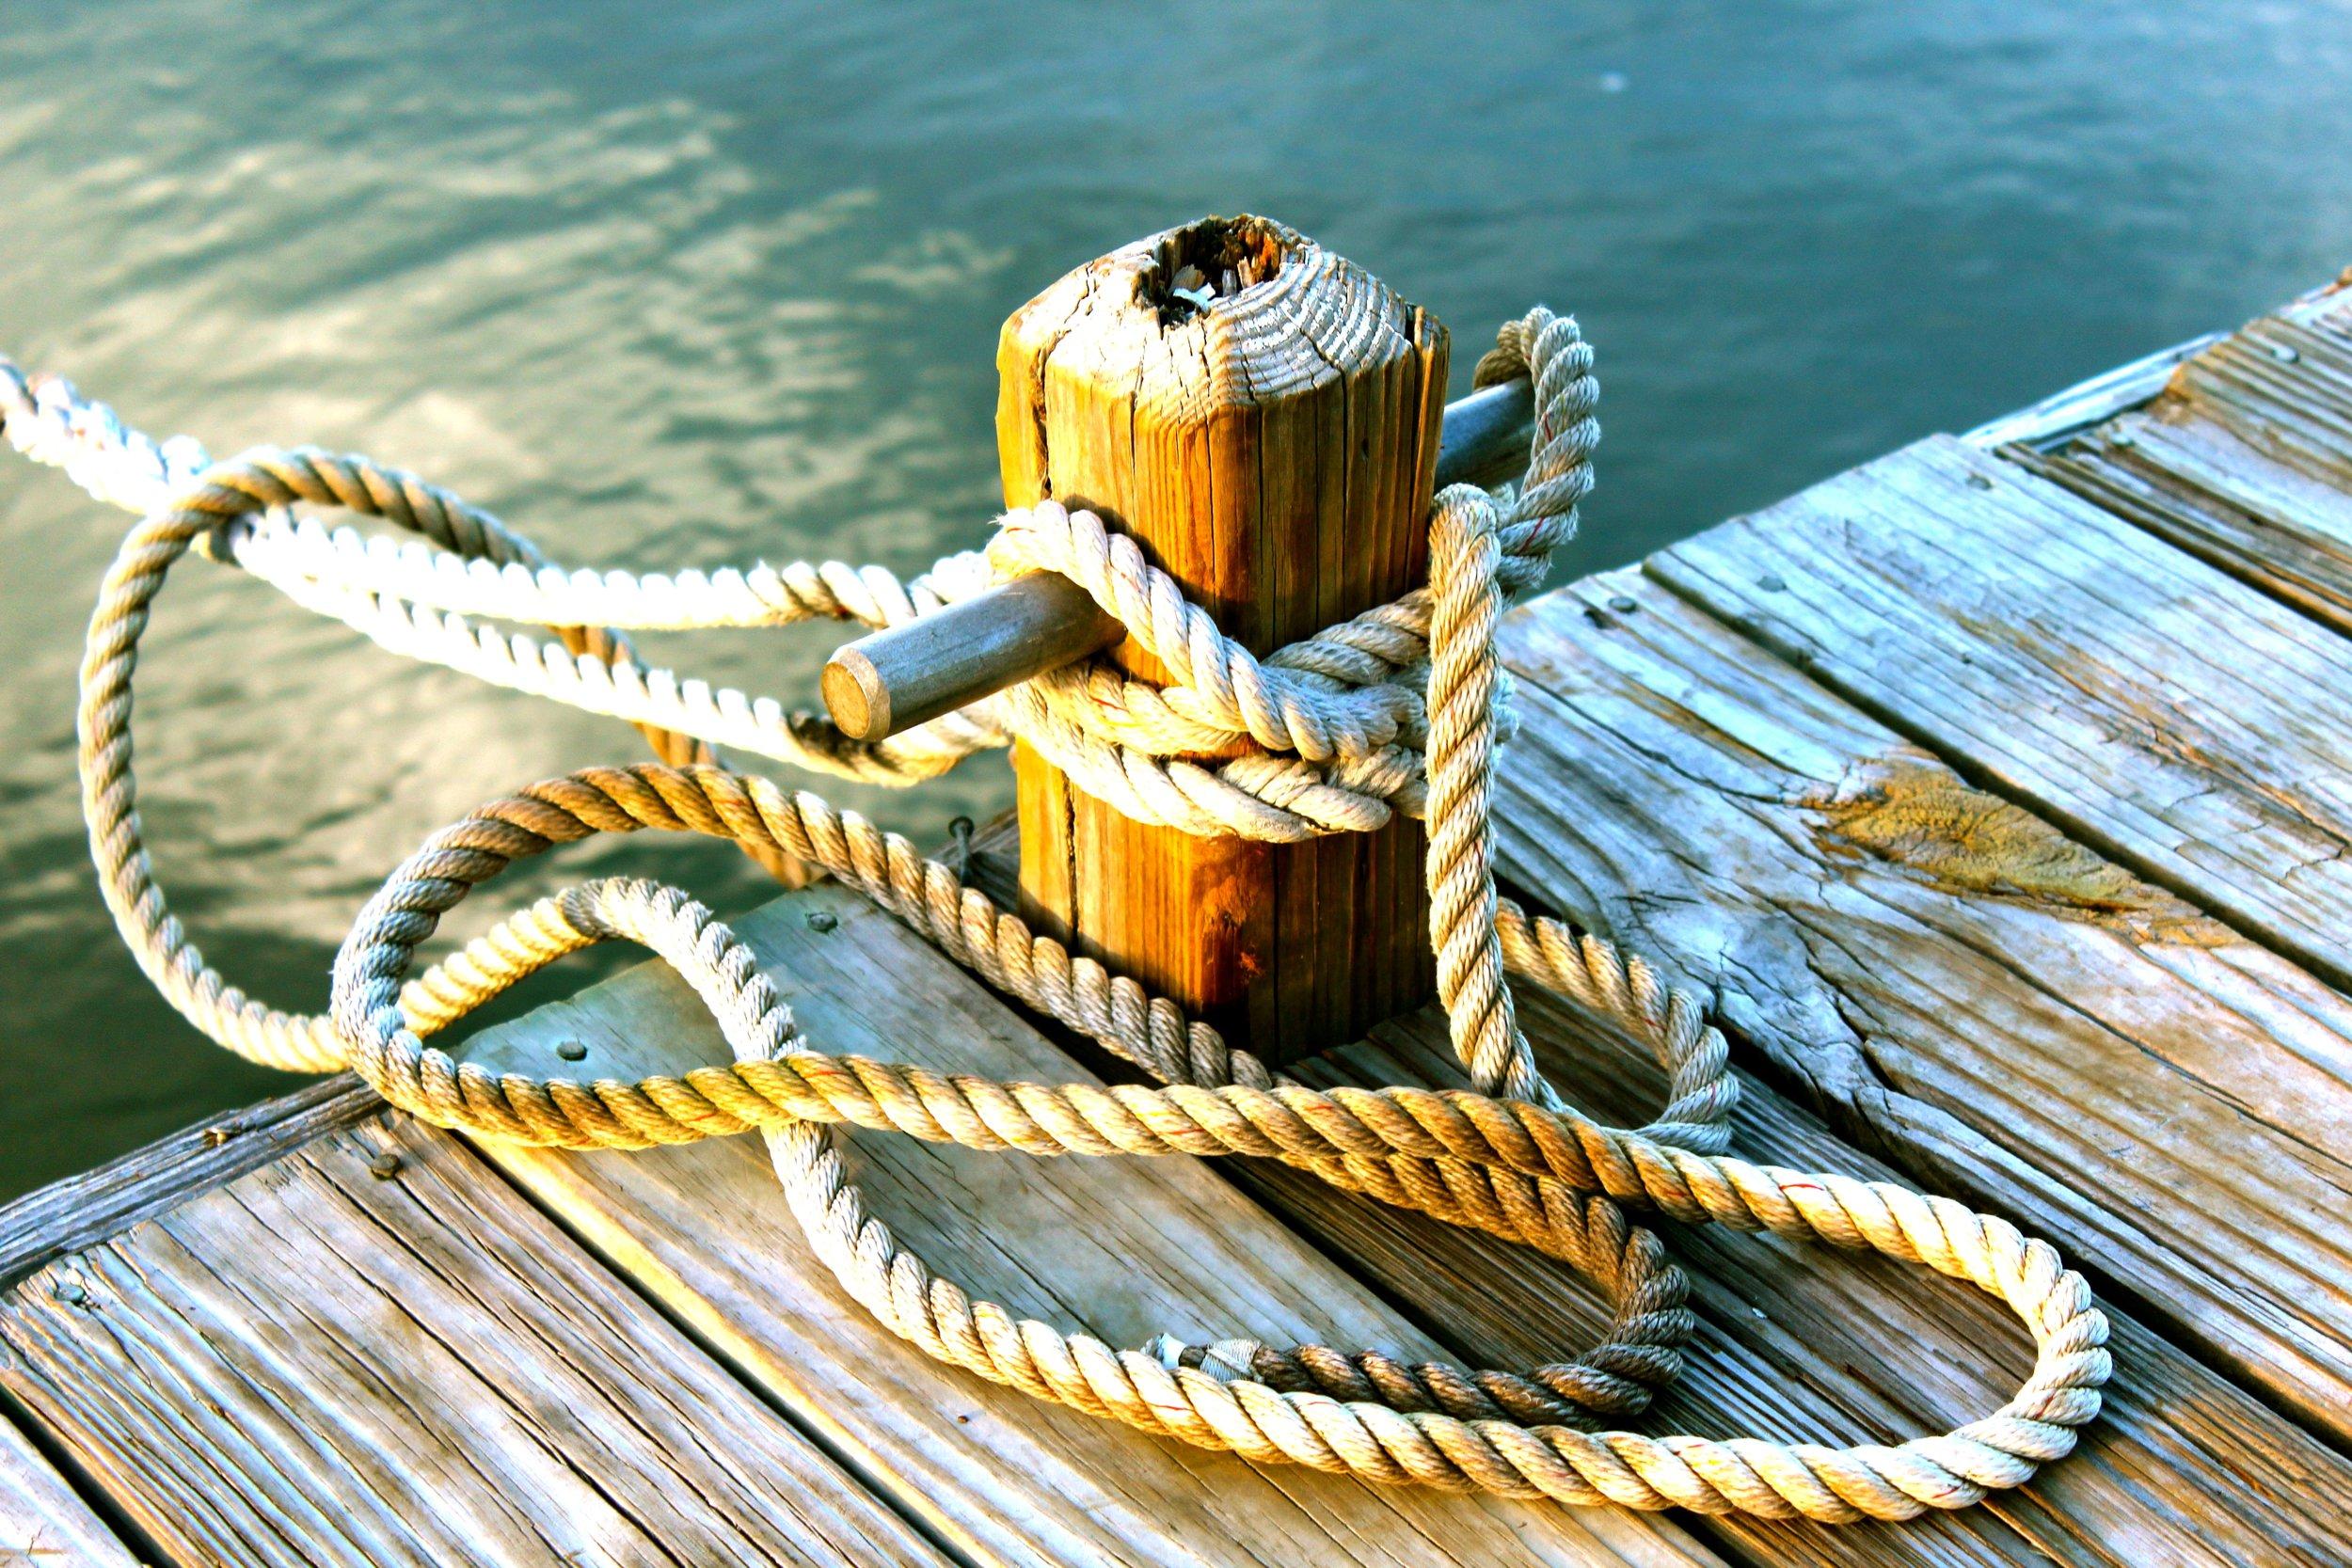 boat-deck-dock-harbor-137533.jpg